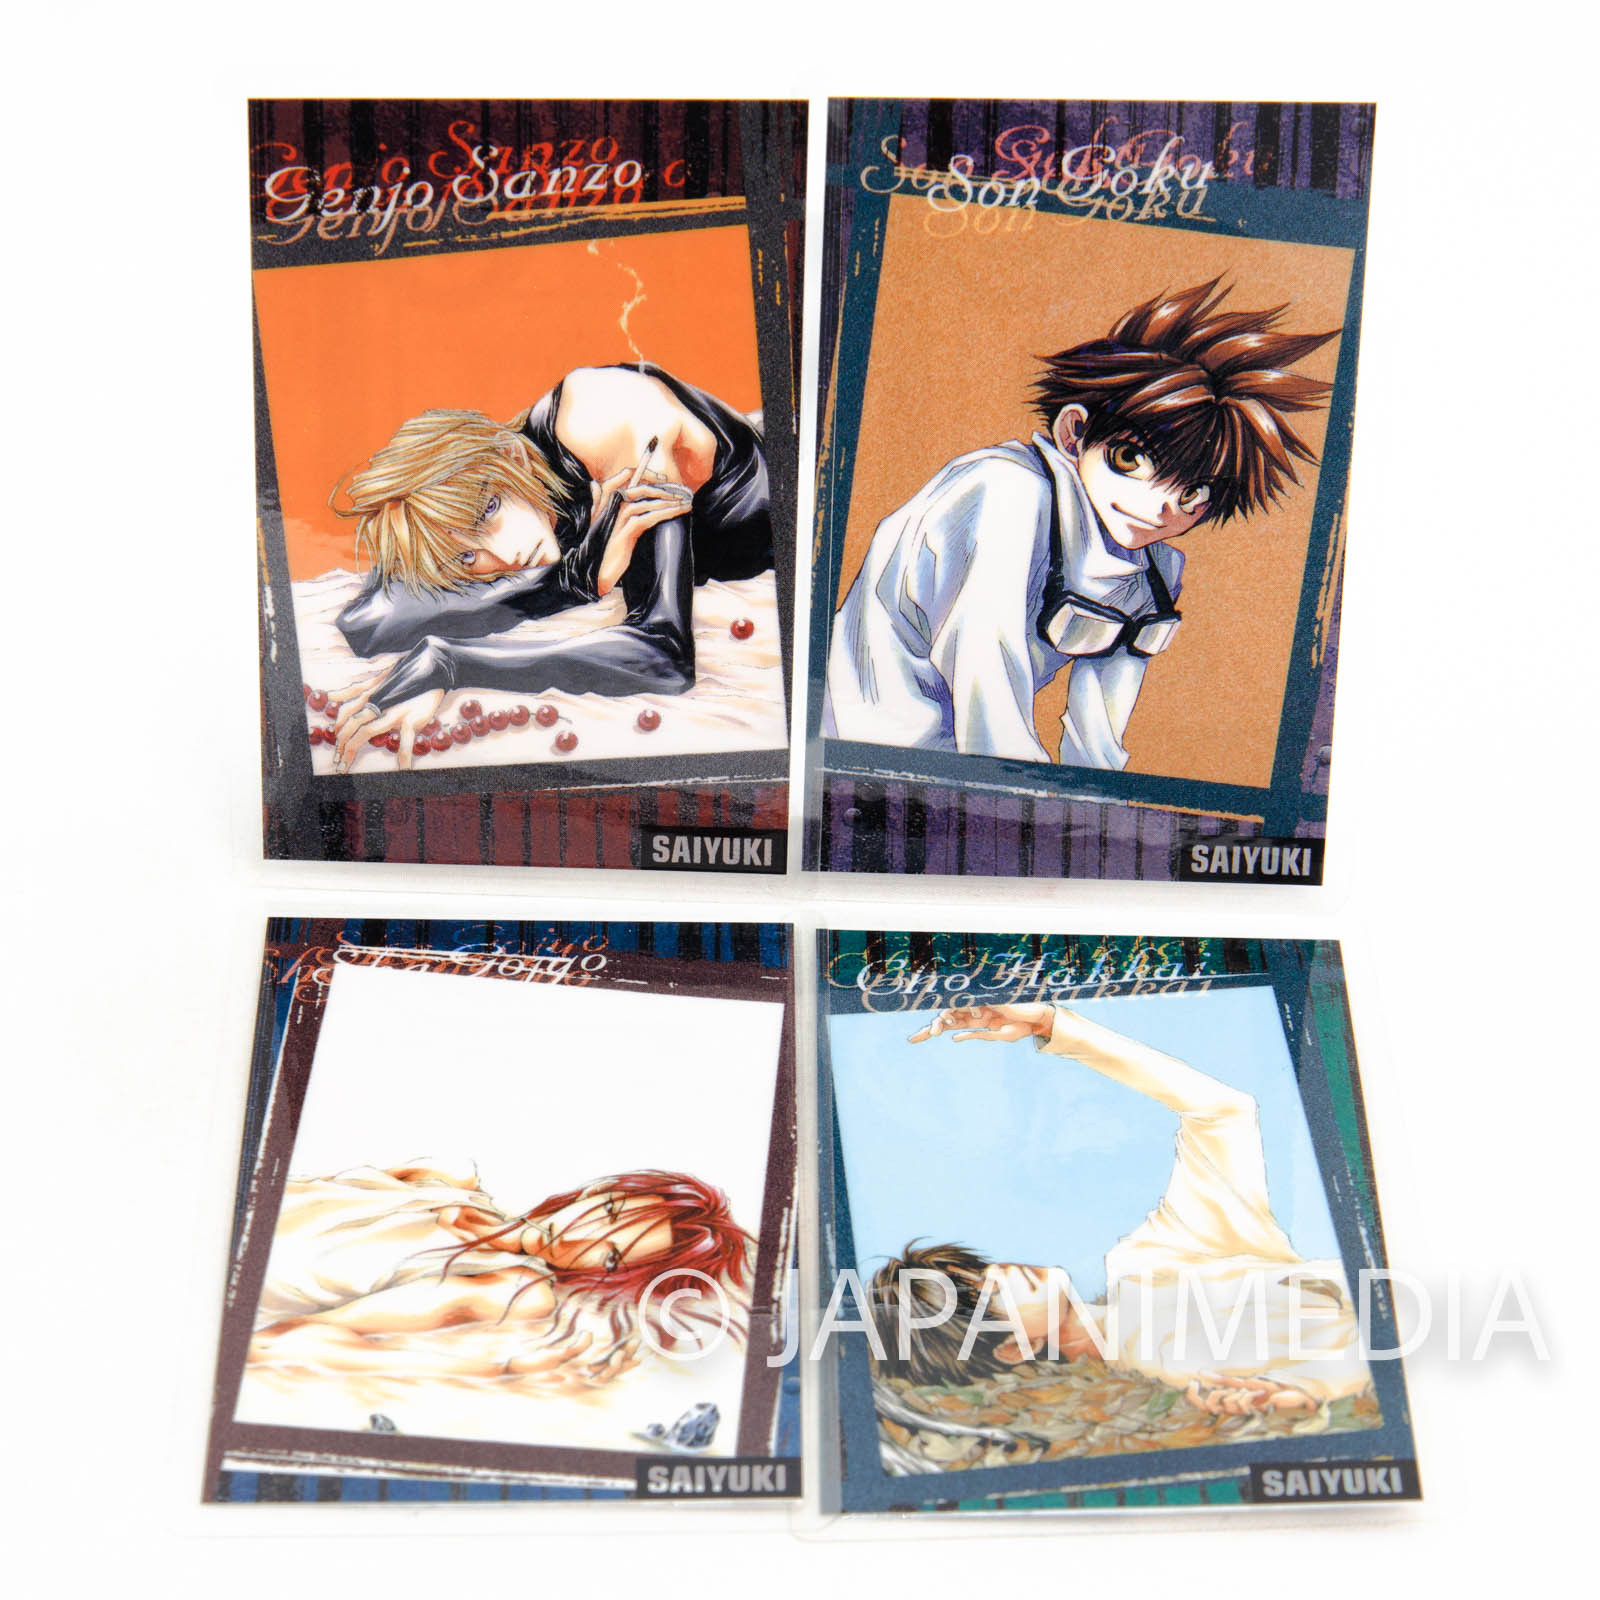 SAIYUKI Laminate cards 4pc Set [Sanzo / Goku / Gojyo / Hakkai] Kazuya Minekura JAPAN ANIME